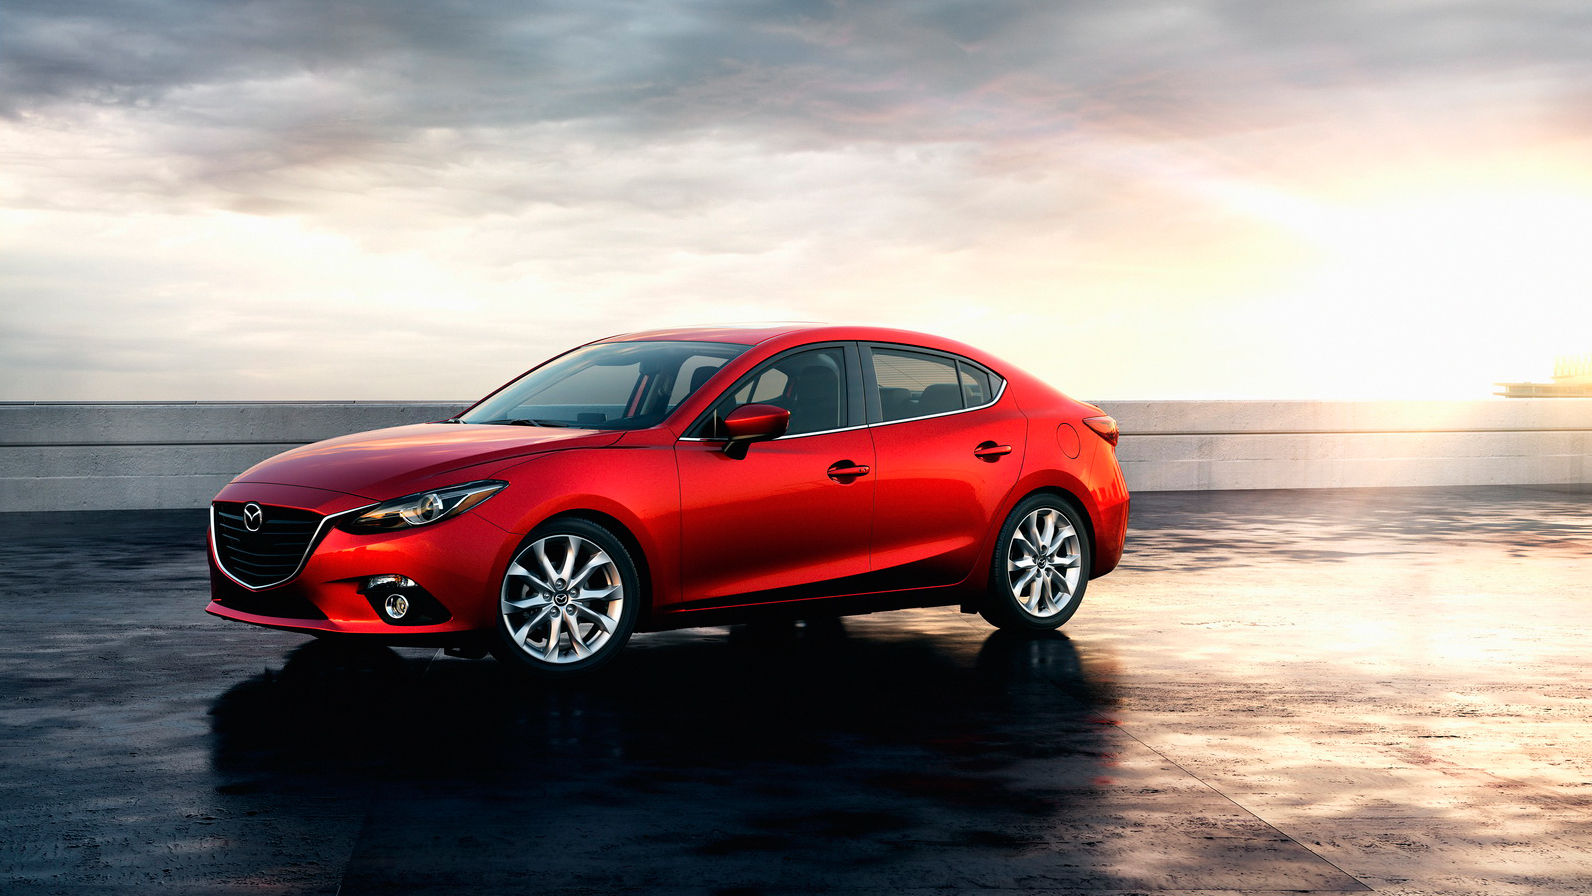 2016 Mazda3 : Fuel-Efficient Compact Sedan for Lachine